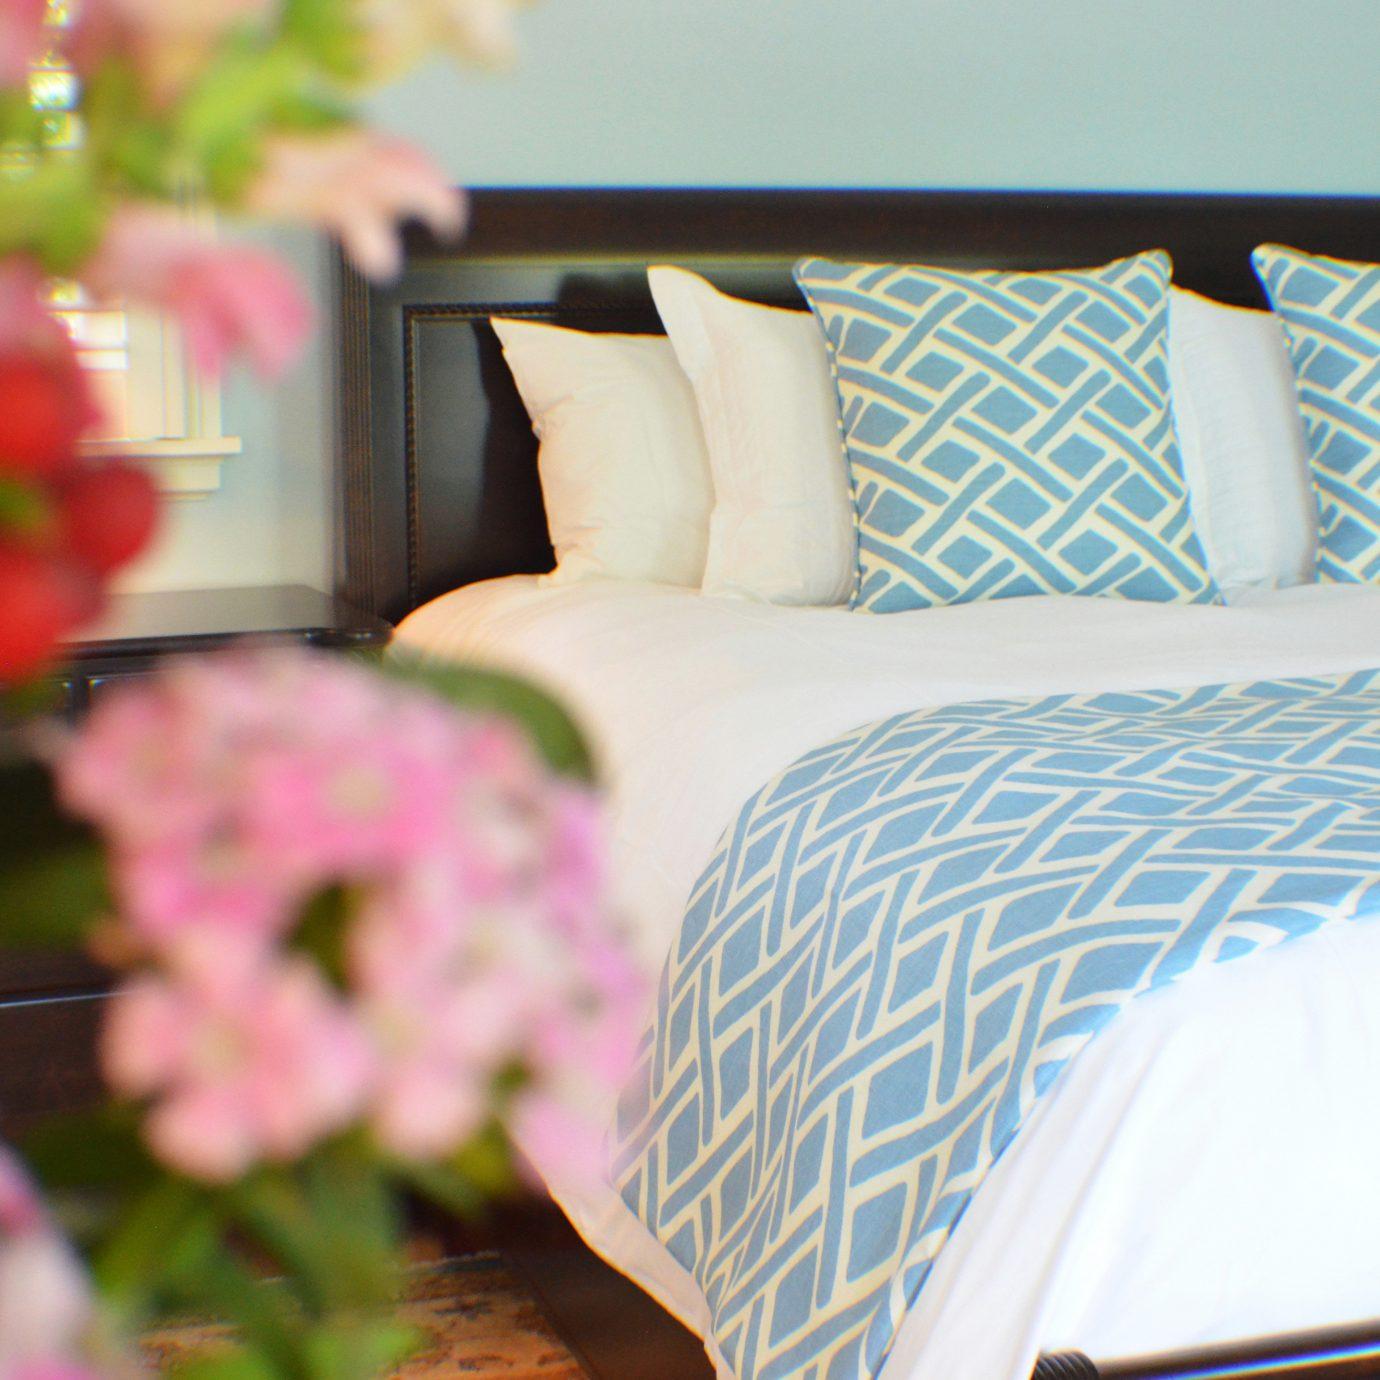 Bedroom Buildings Cultural Landmarks Museums color flower bed sheet textile material